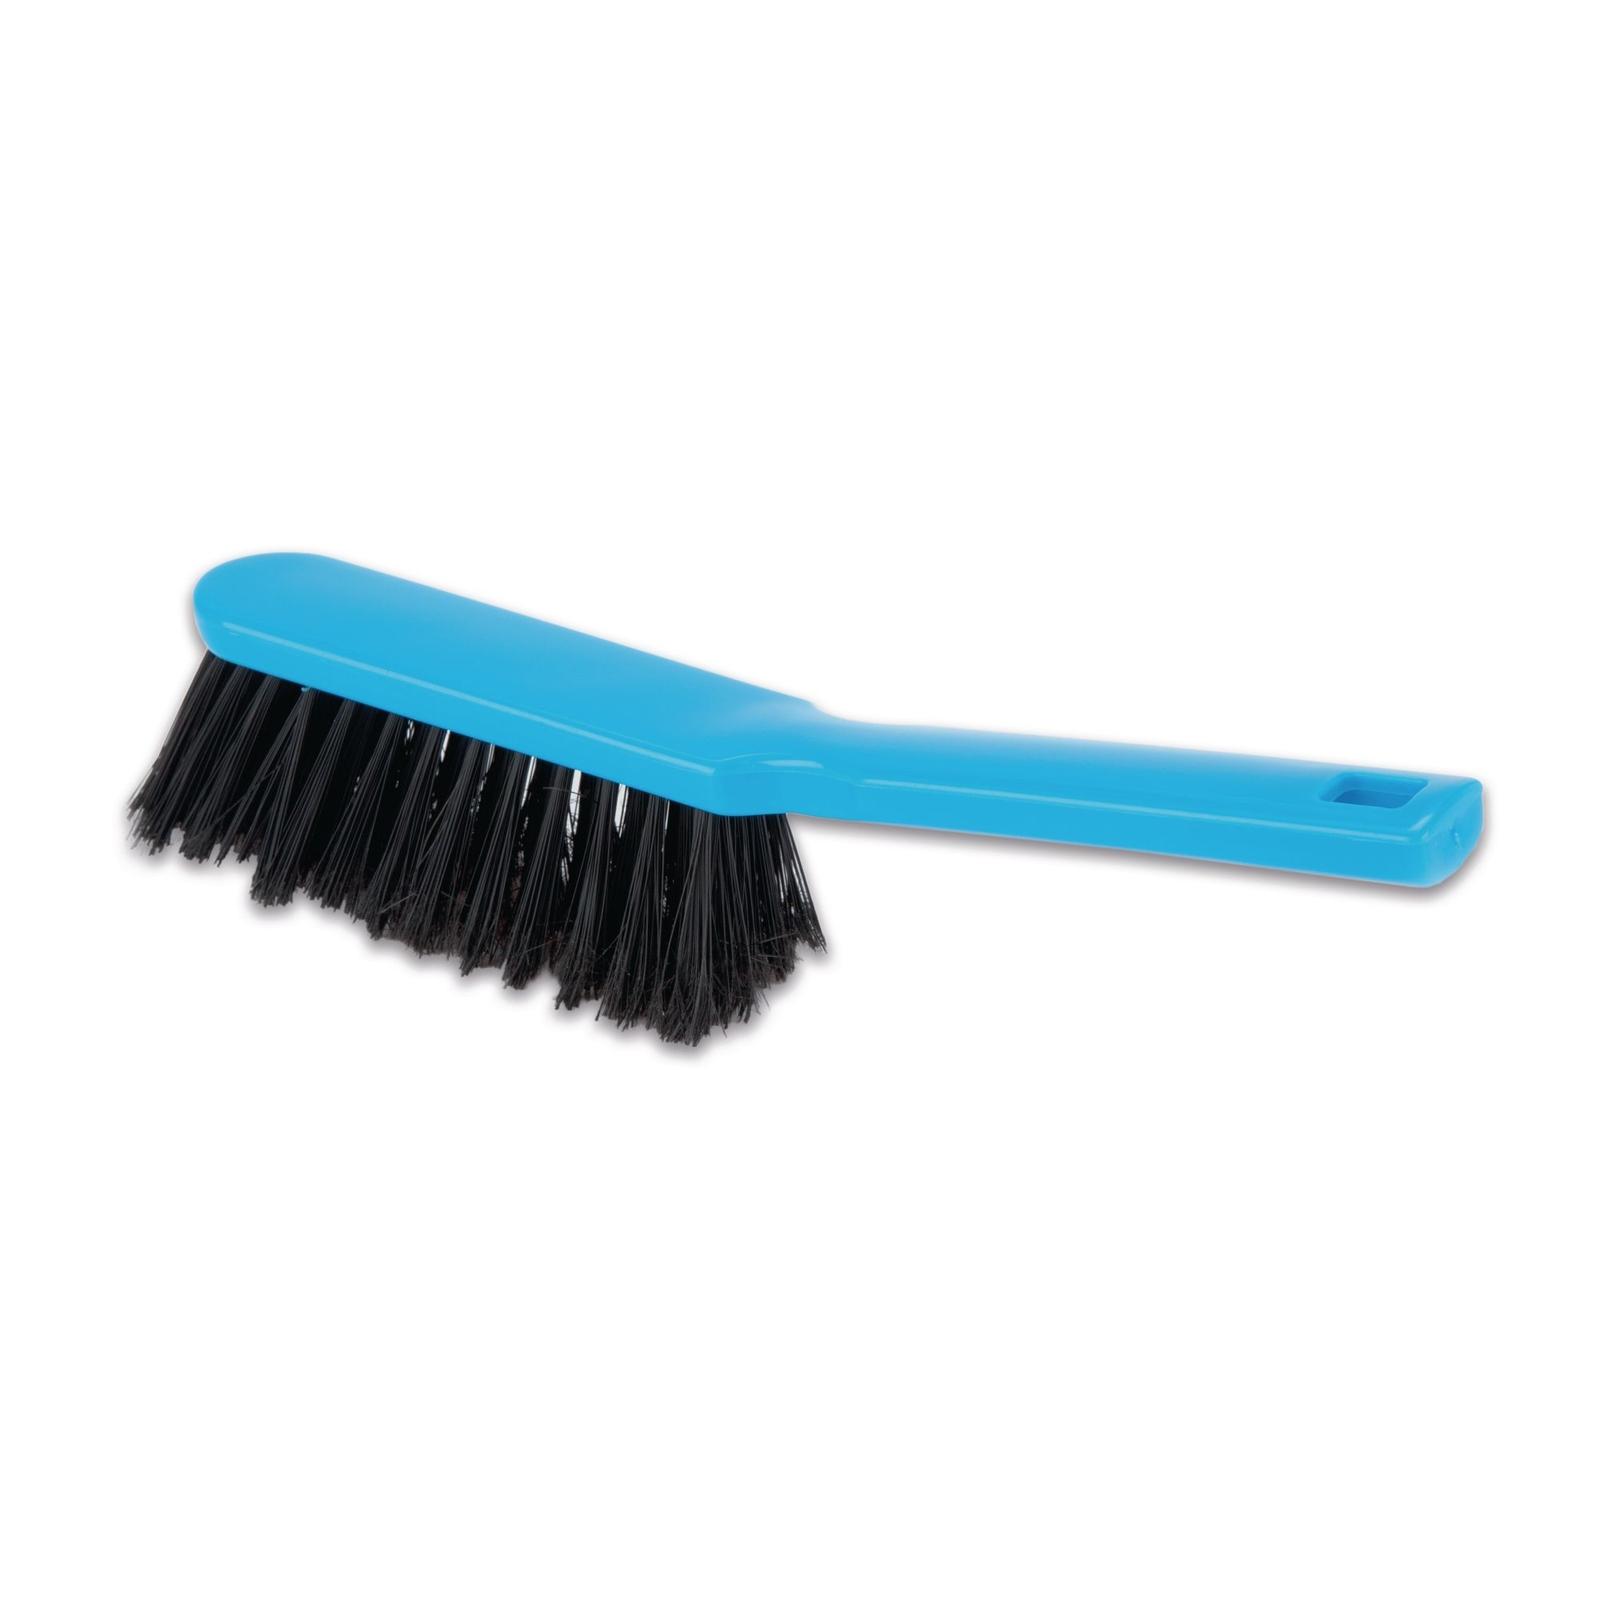 Dustpan Brush - Blue